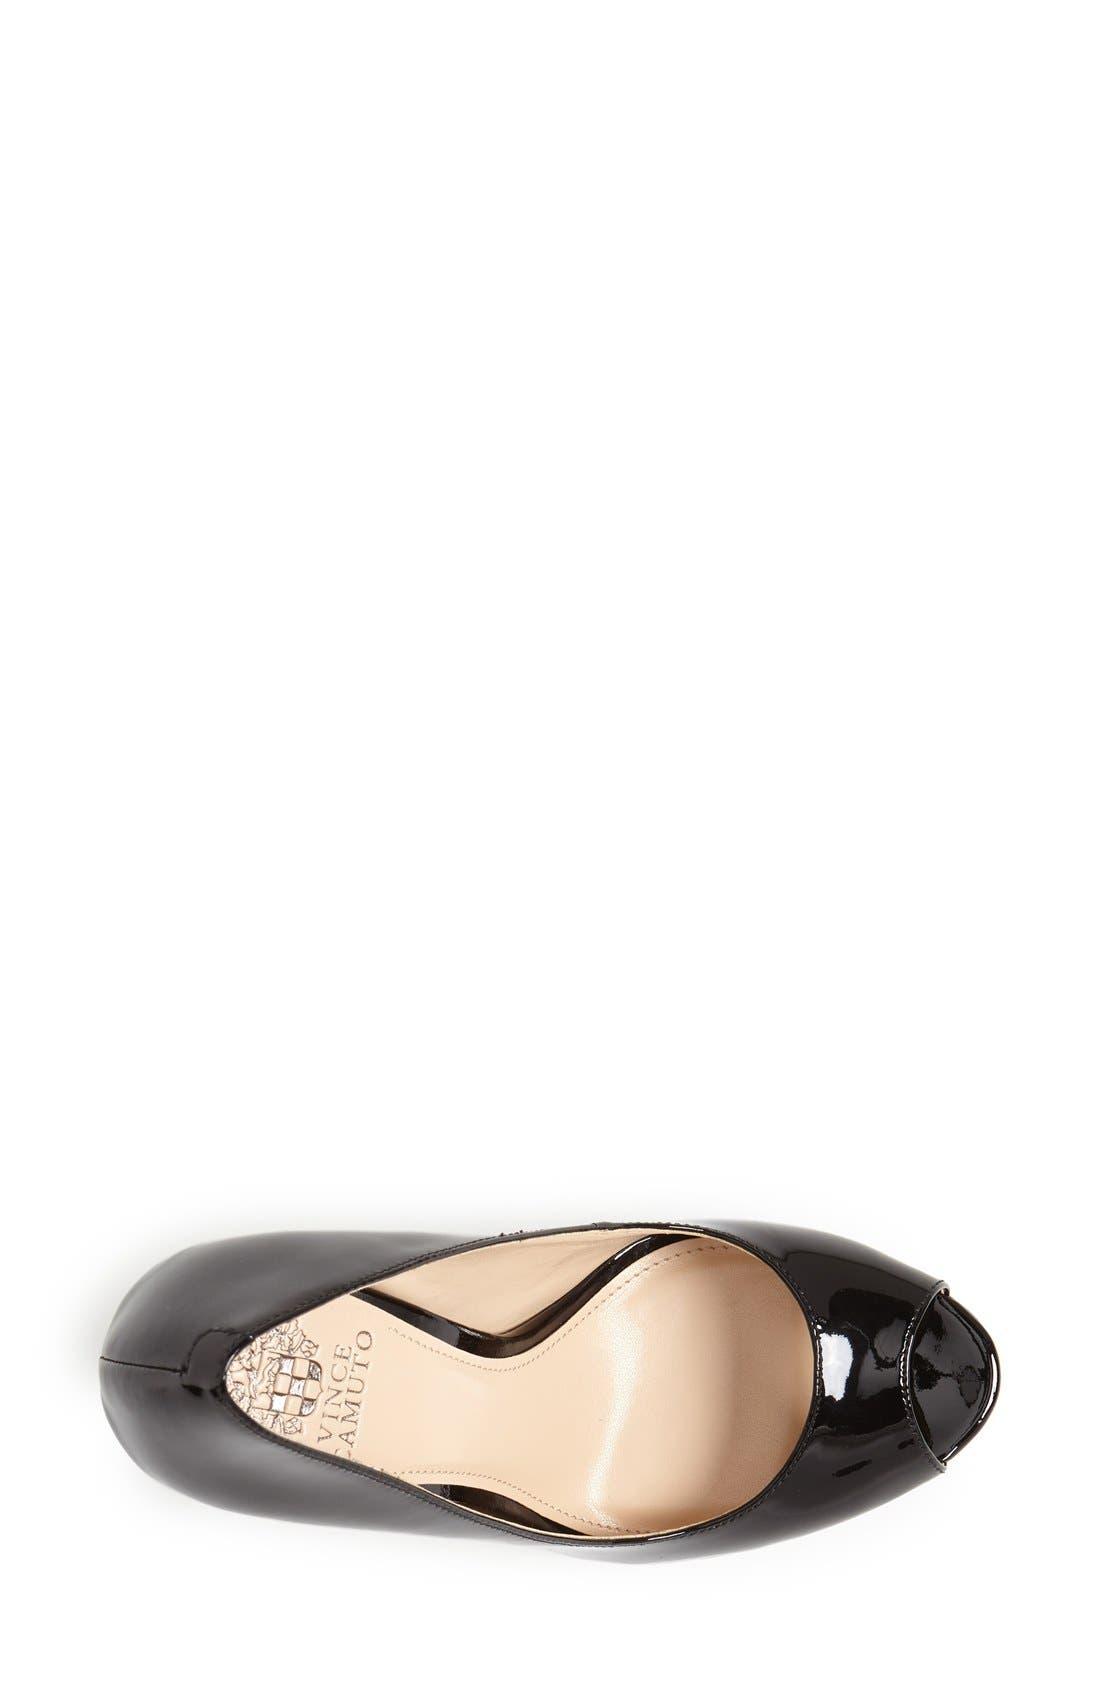 VINCE CAMUTO, 'Lorim' Peep Toe Platform Pump, Alternate thumbnail 3, color, 001